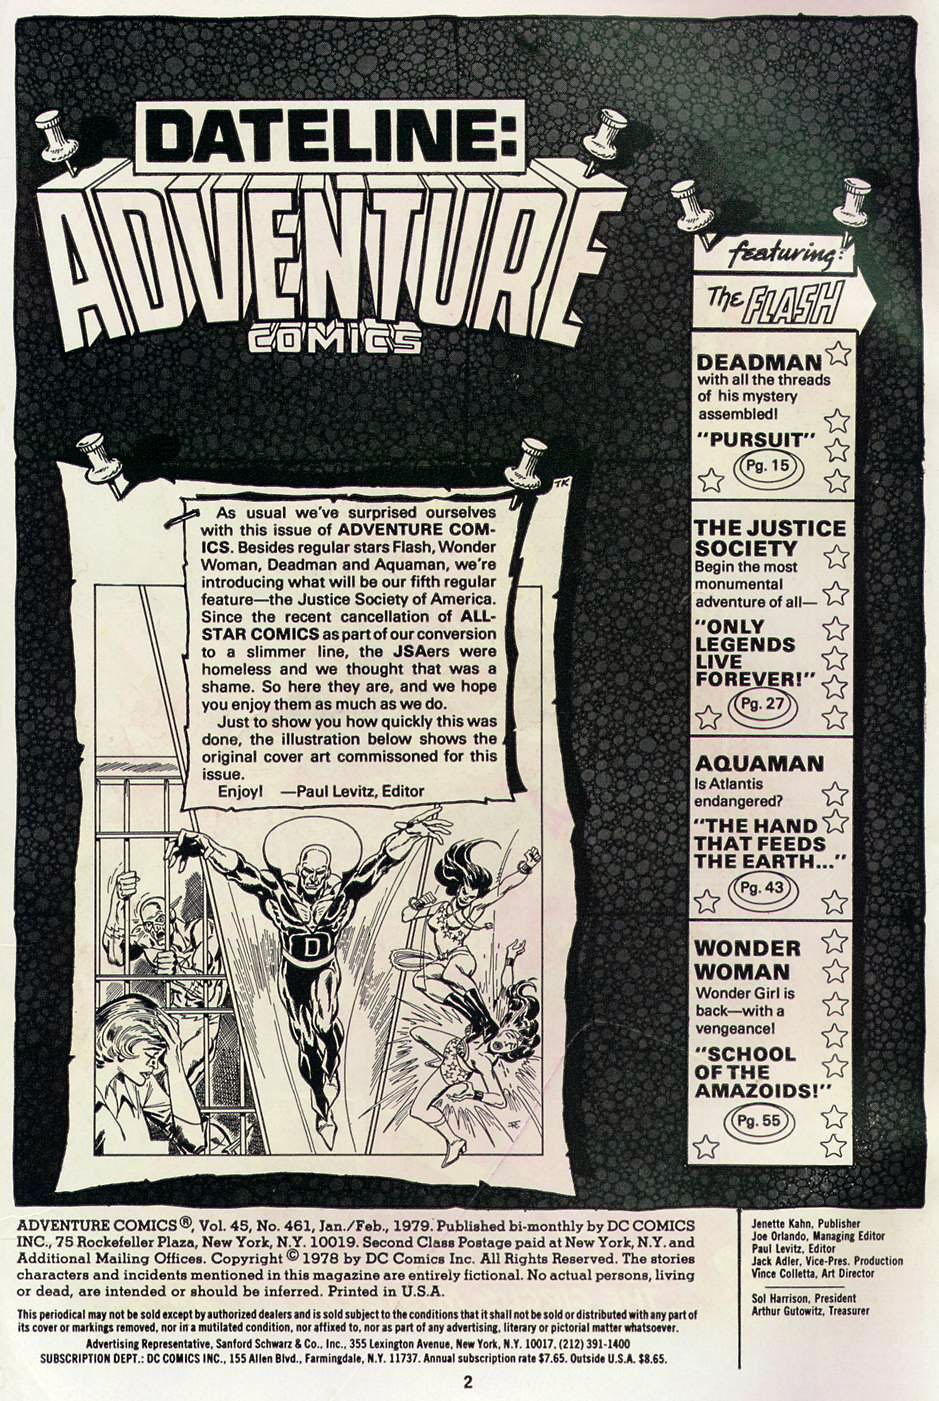 Read online Adventure Comics (1938) comic -  Issue #461 - 2